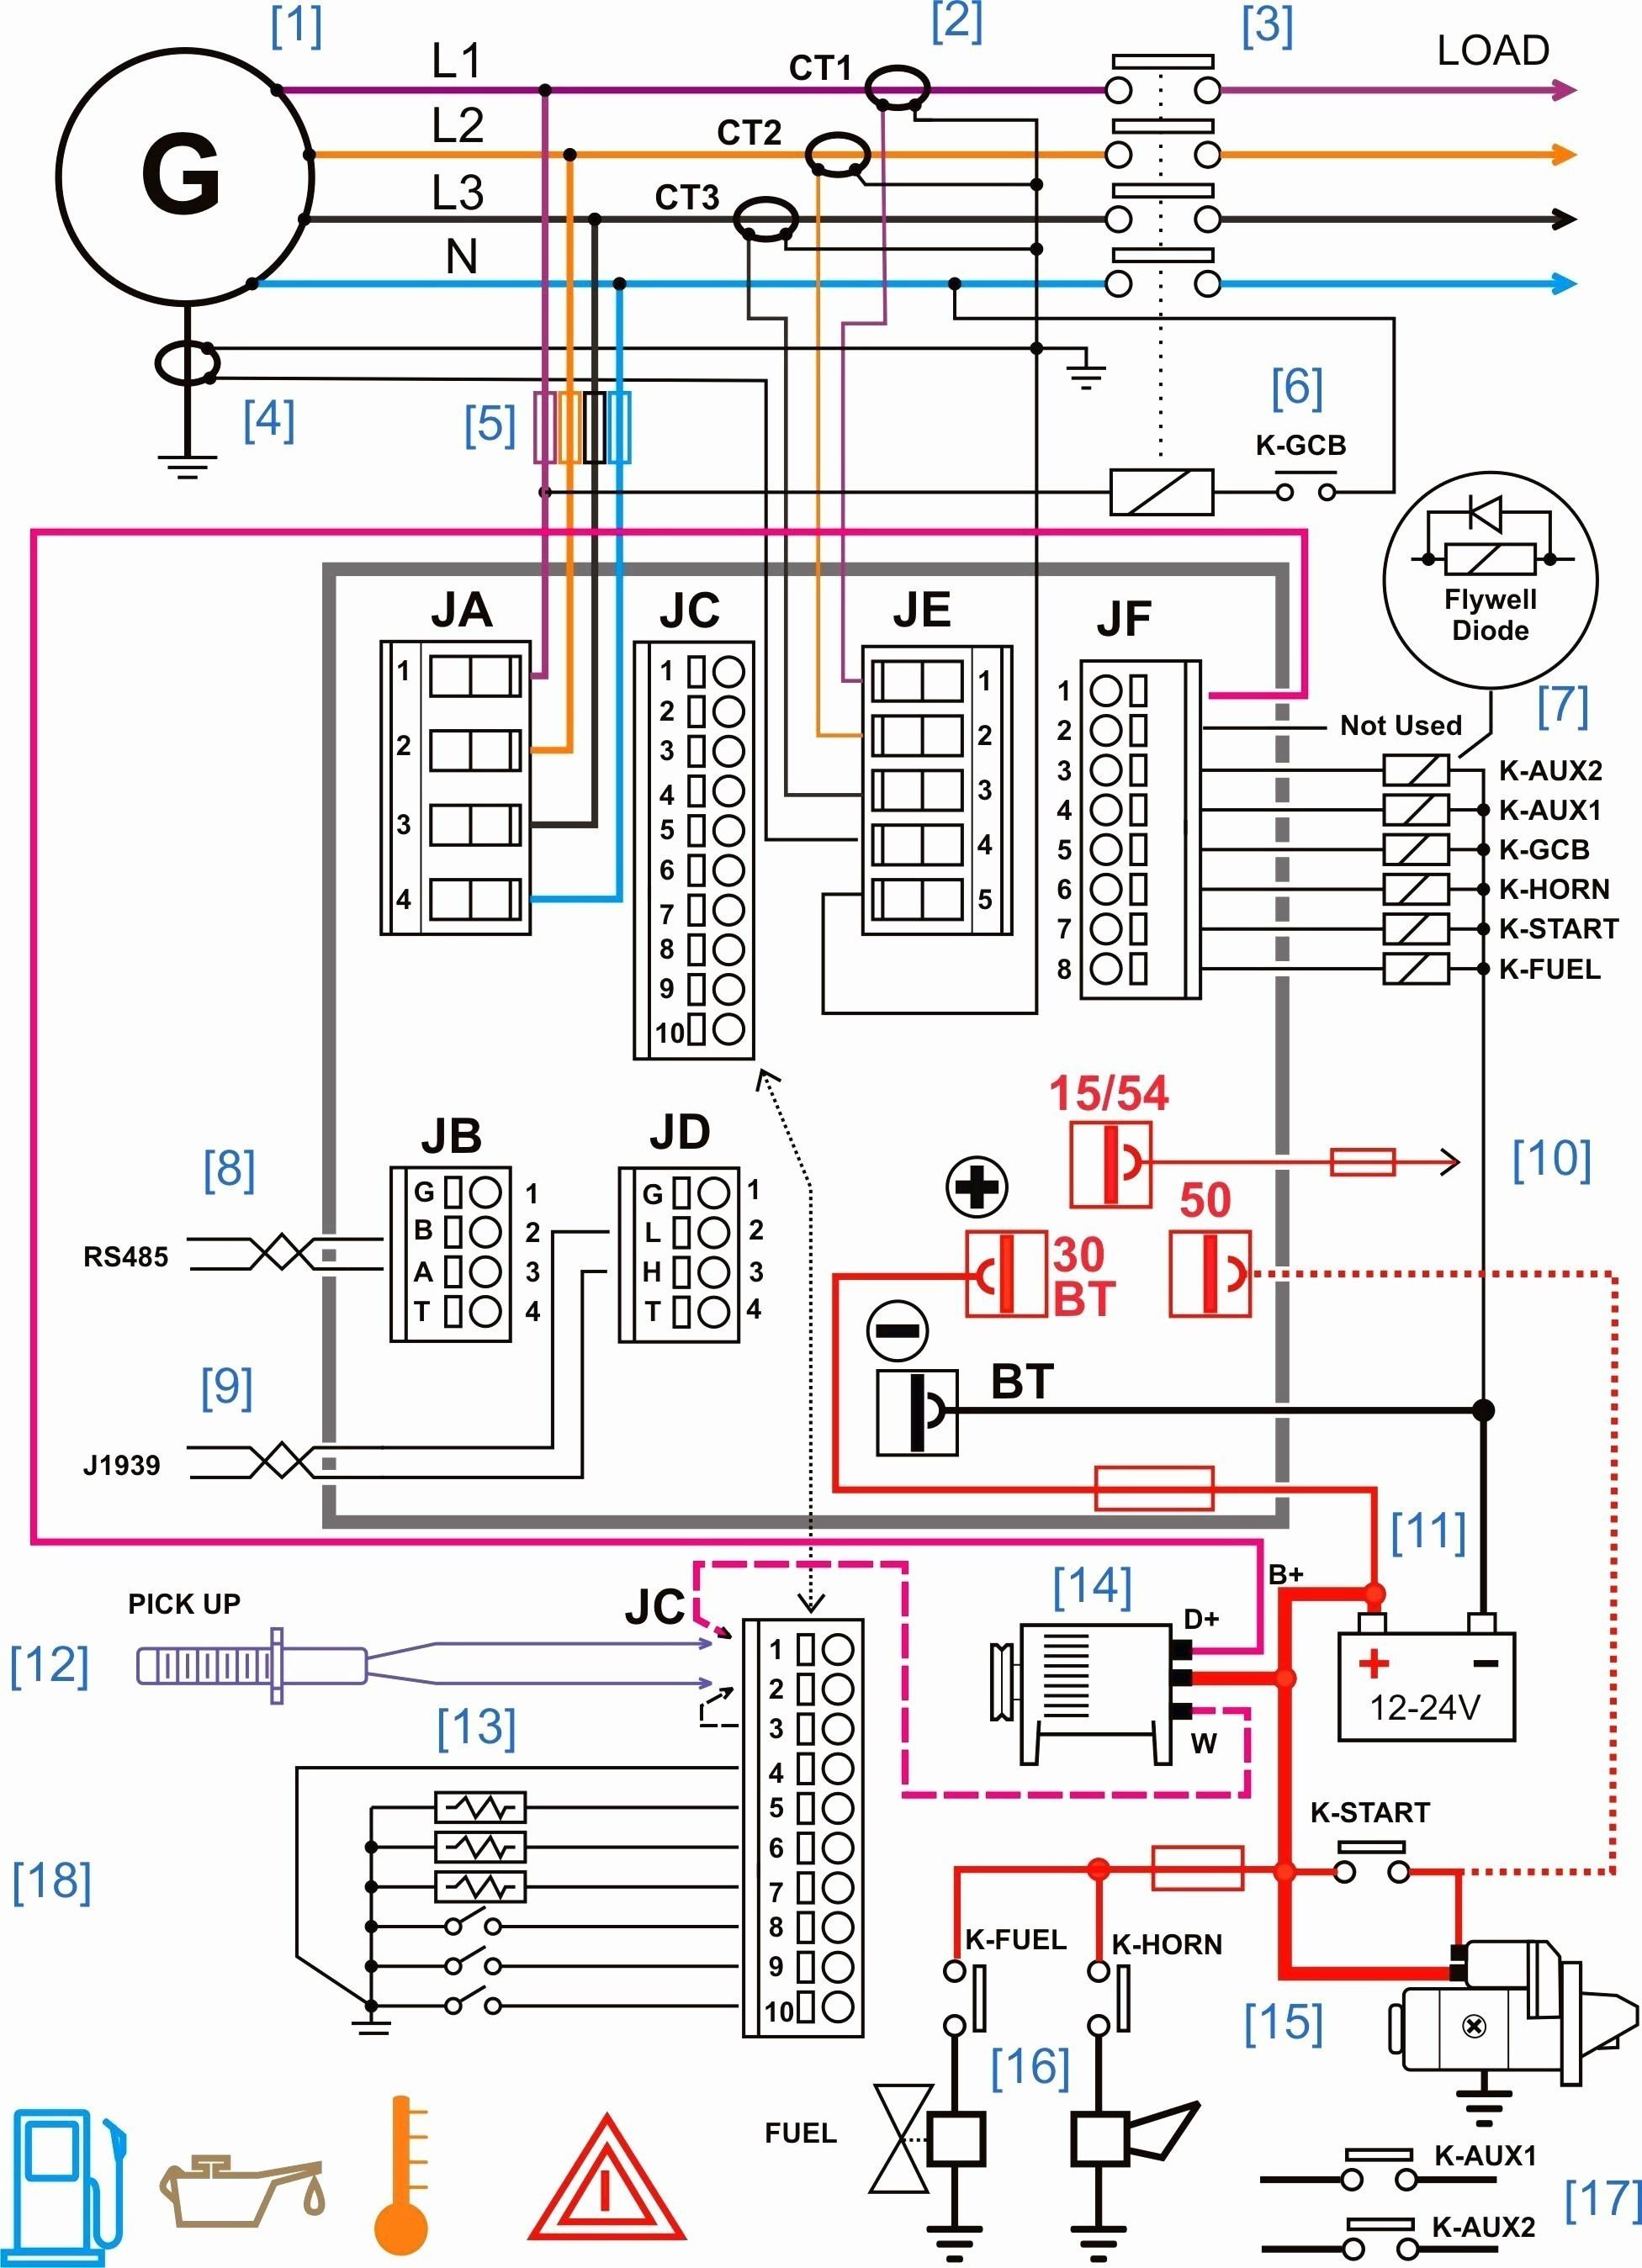 Diagram Of Under A Car Wiring Diagram Book Best Wiring Harness Diagram Book Car Stereo Of Diagram Of Under A Car